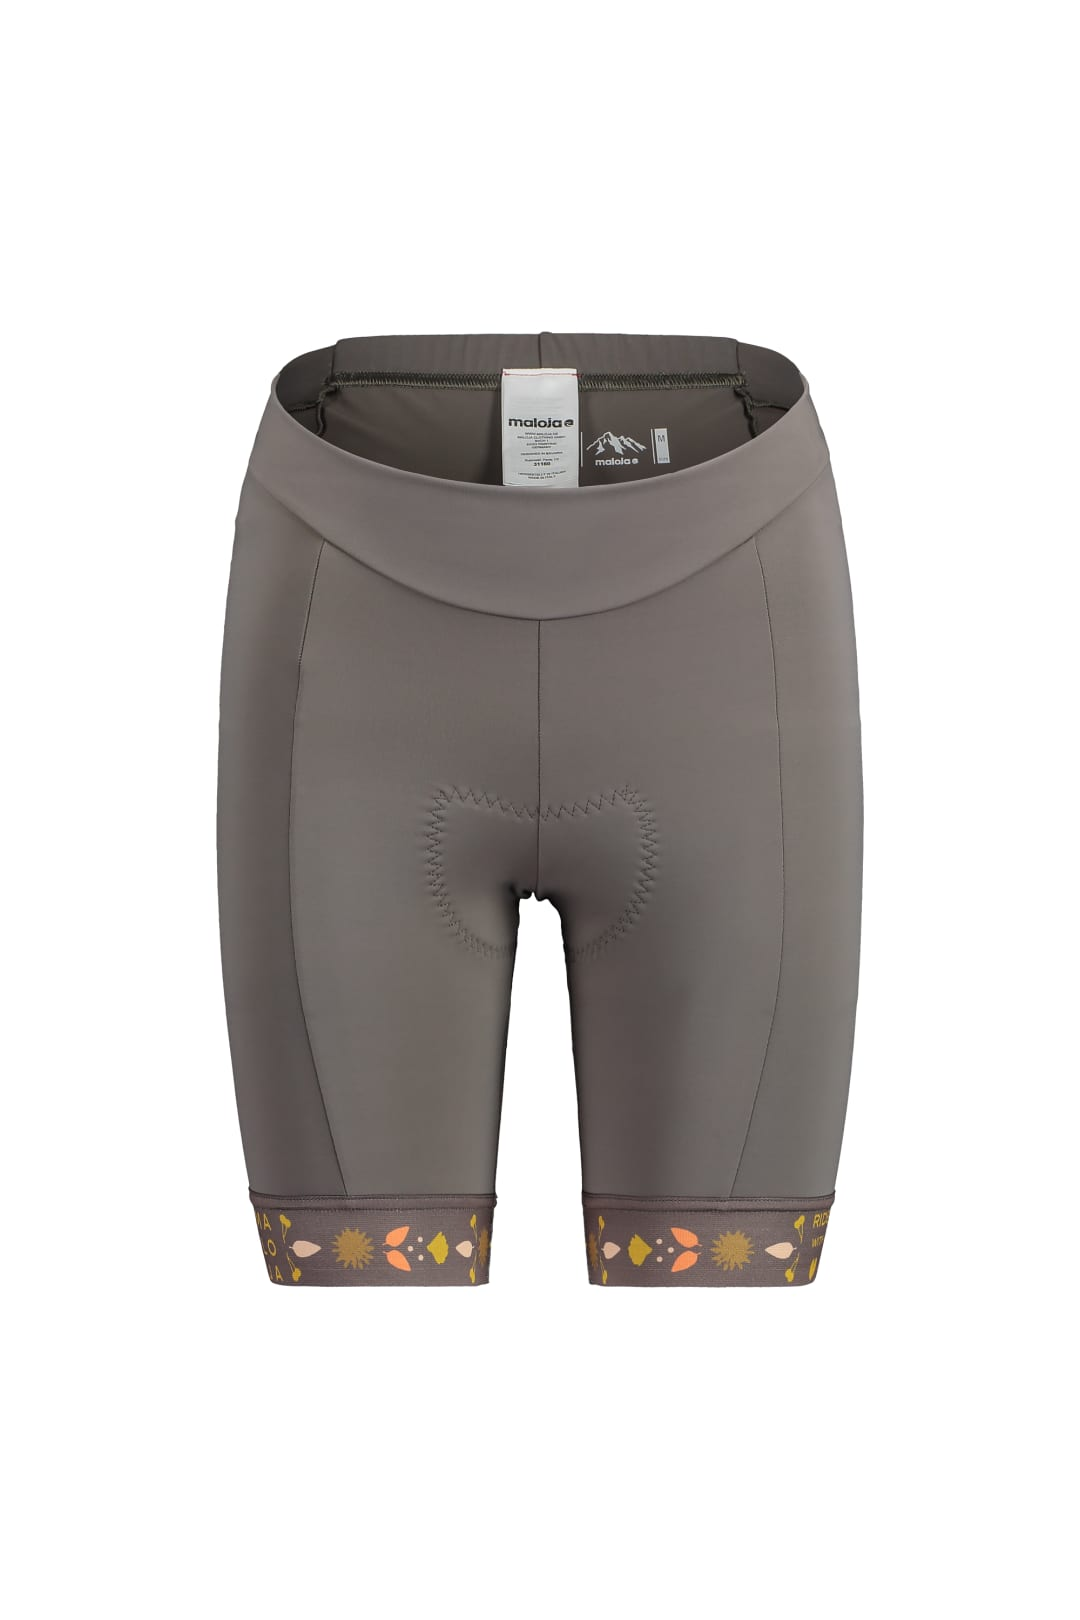 Maloja HankM Pants 1//2 Herren Bike Short Radbody Radhose 21232 Bib Shorts